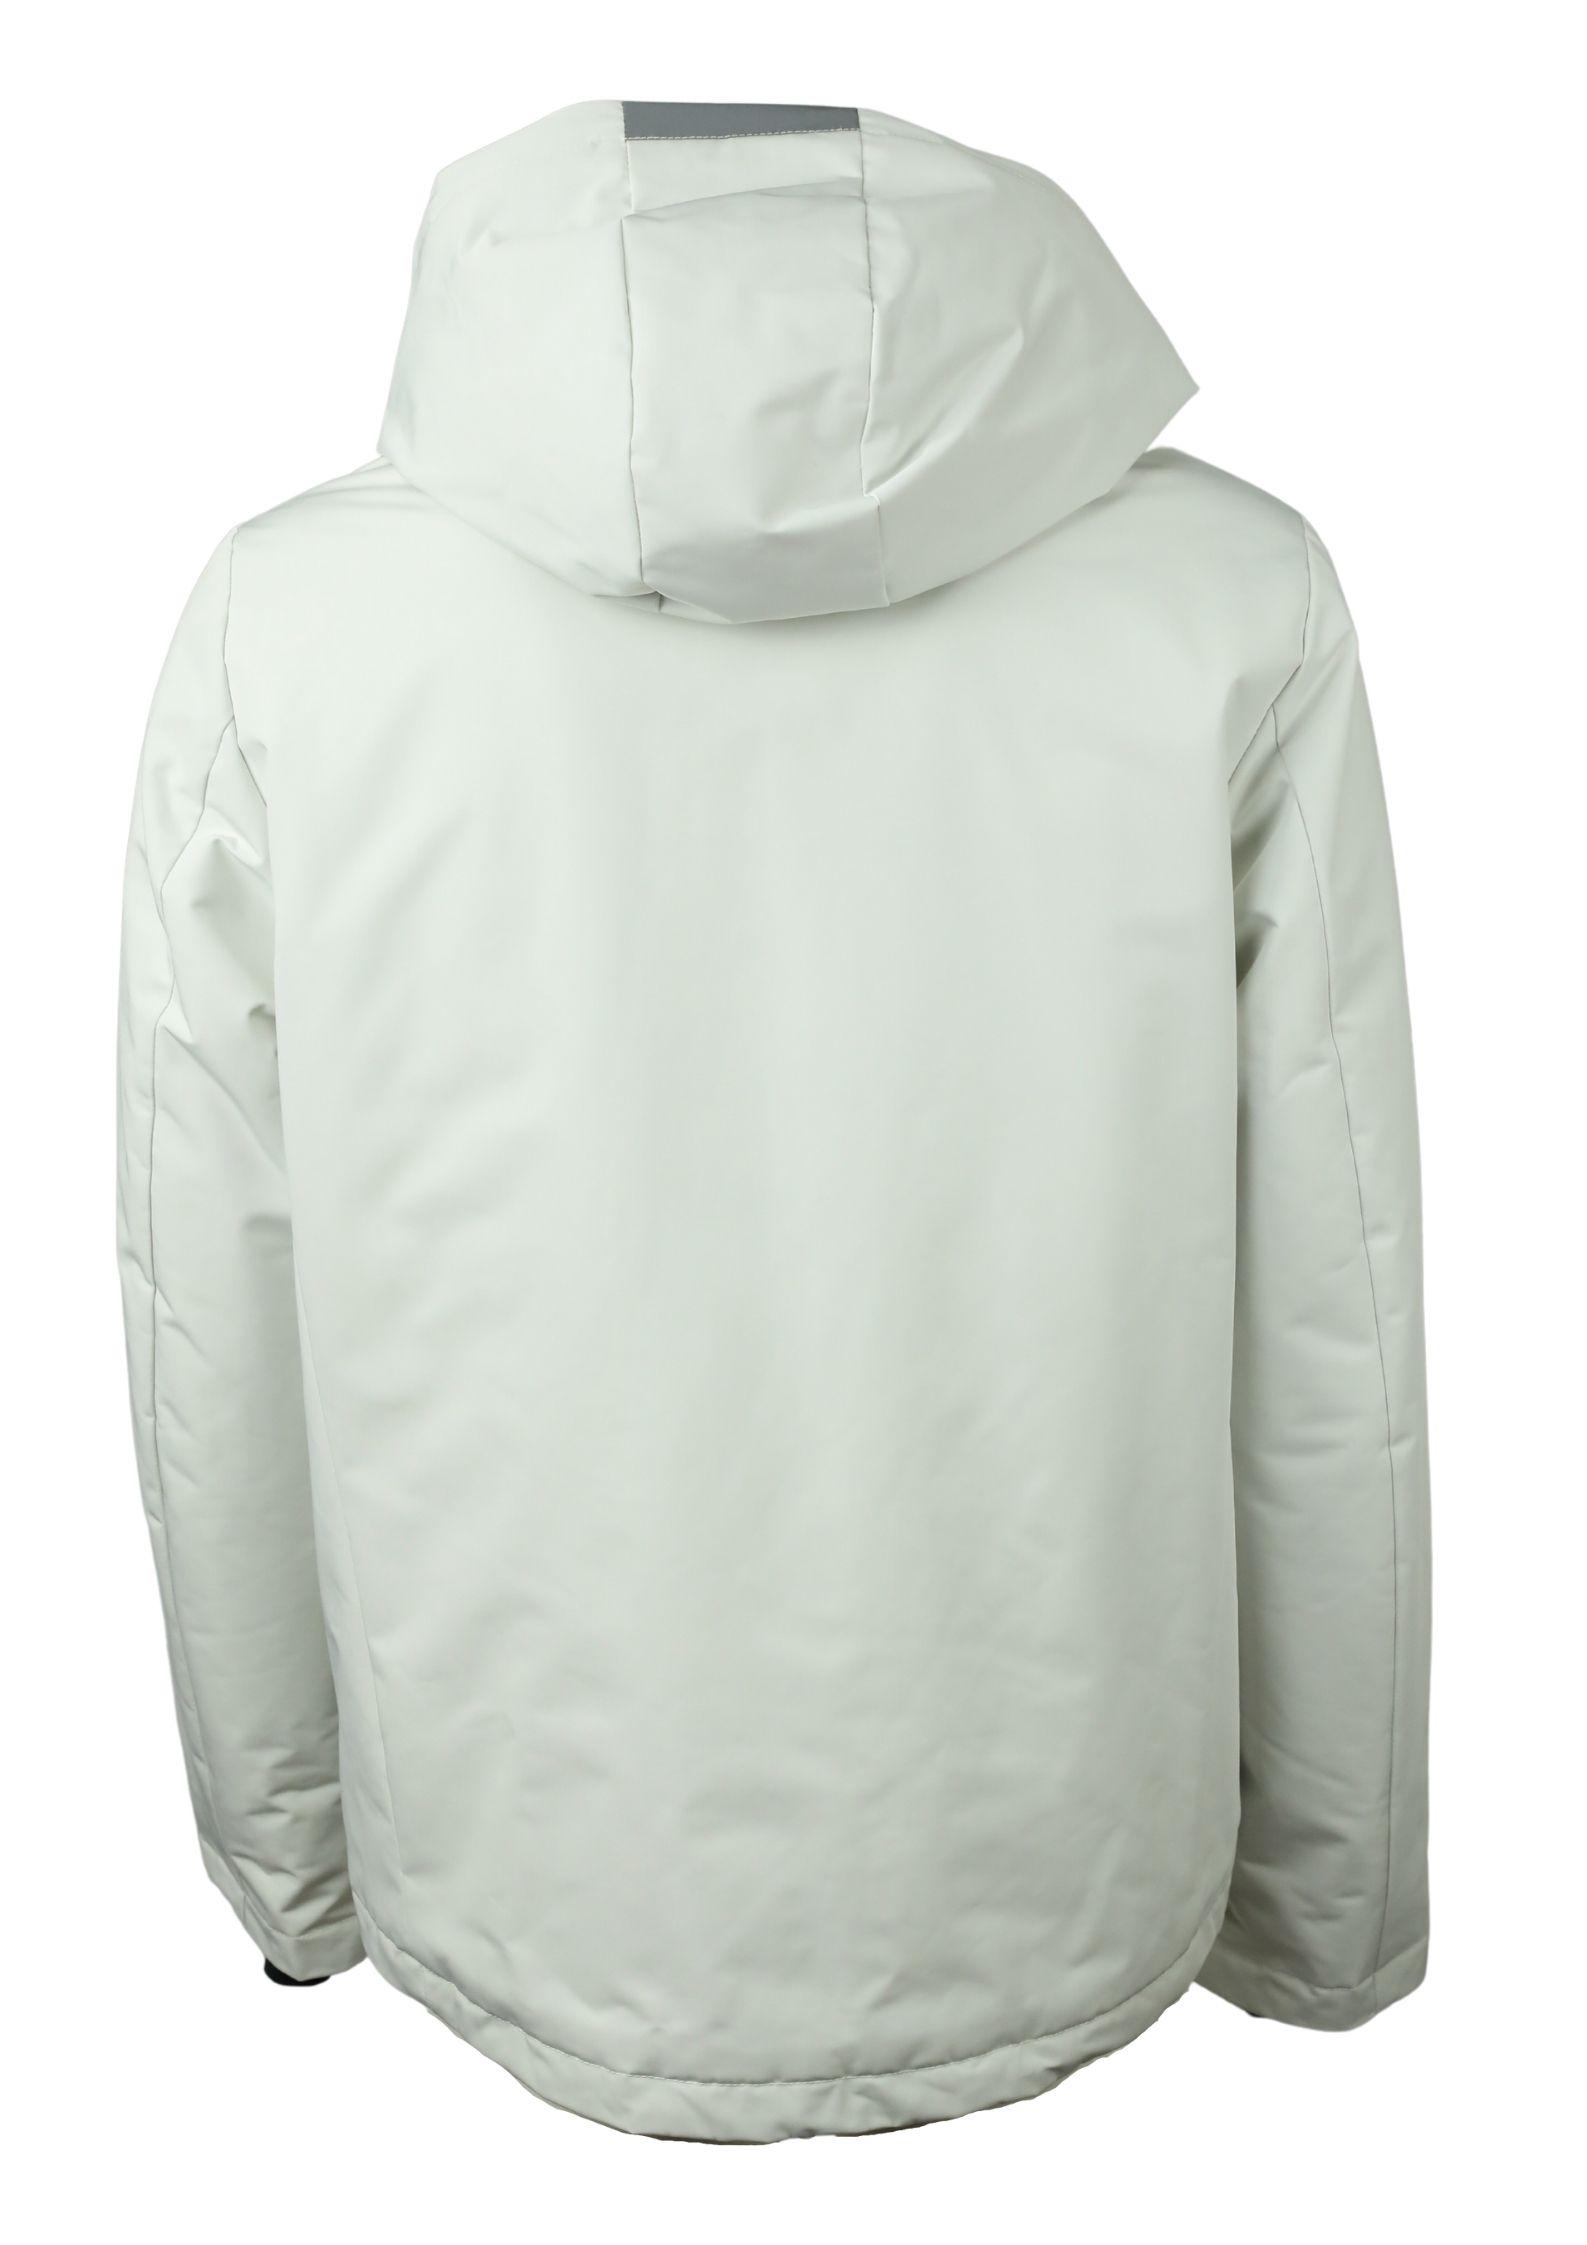 Water-repellent jacket People of Shibuya | Jackets | KITAPM769007